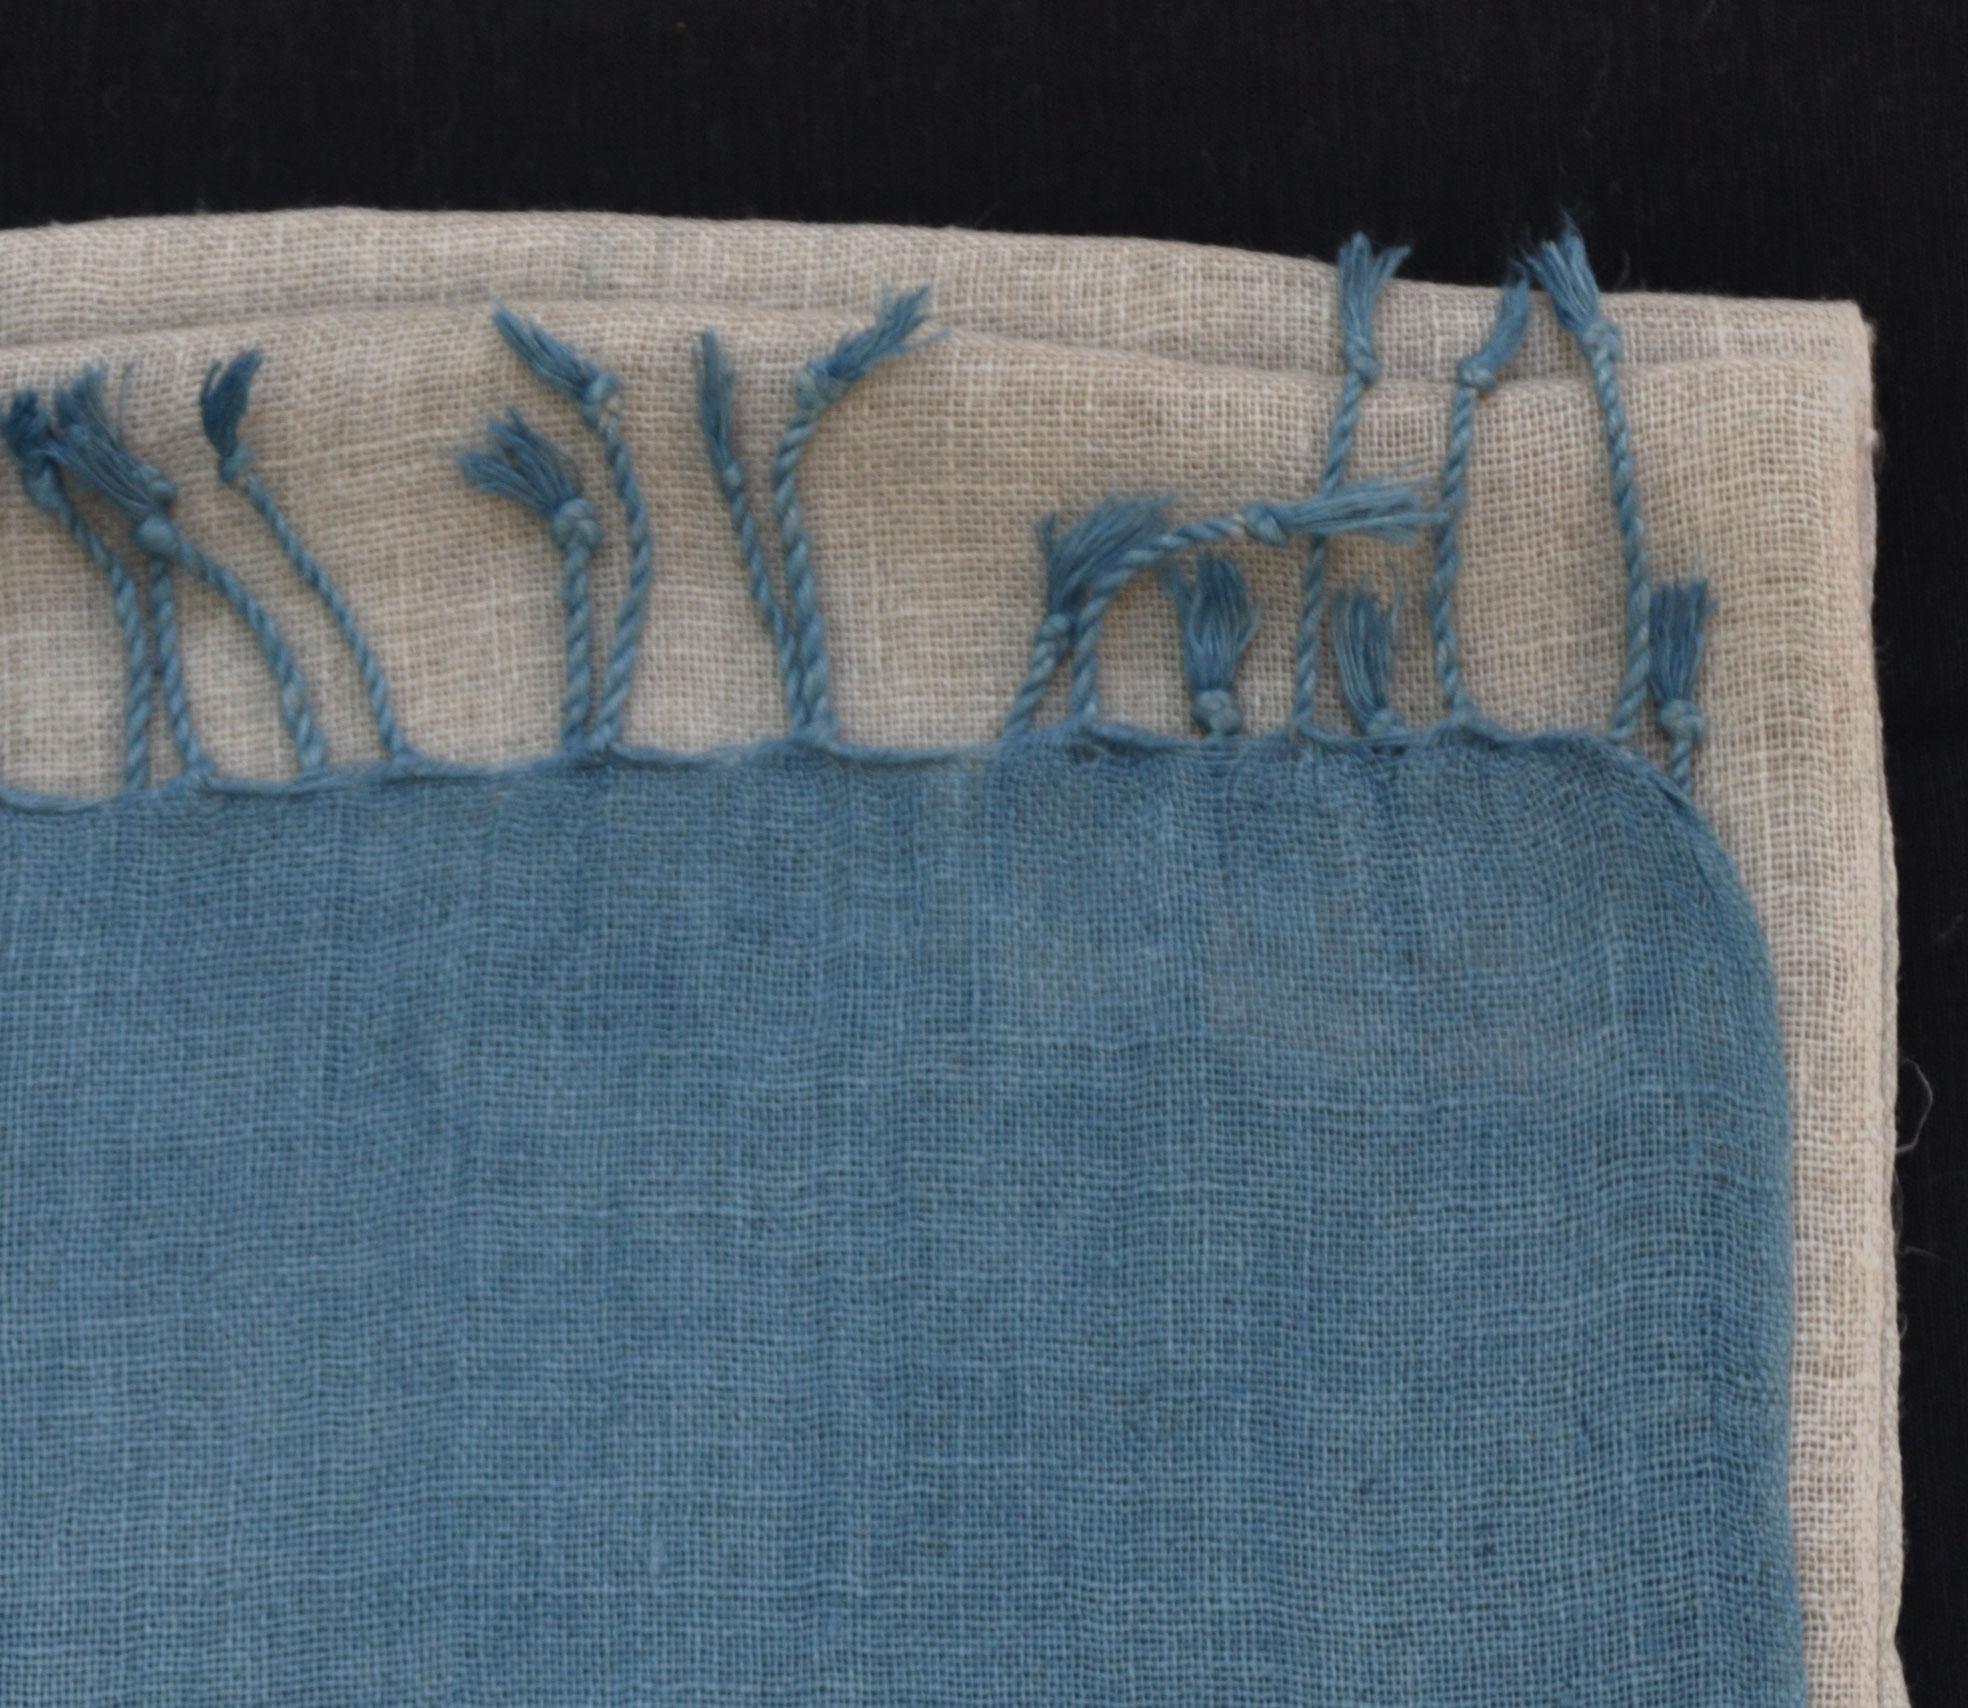 Folded linen scarf with indigo